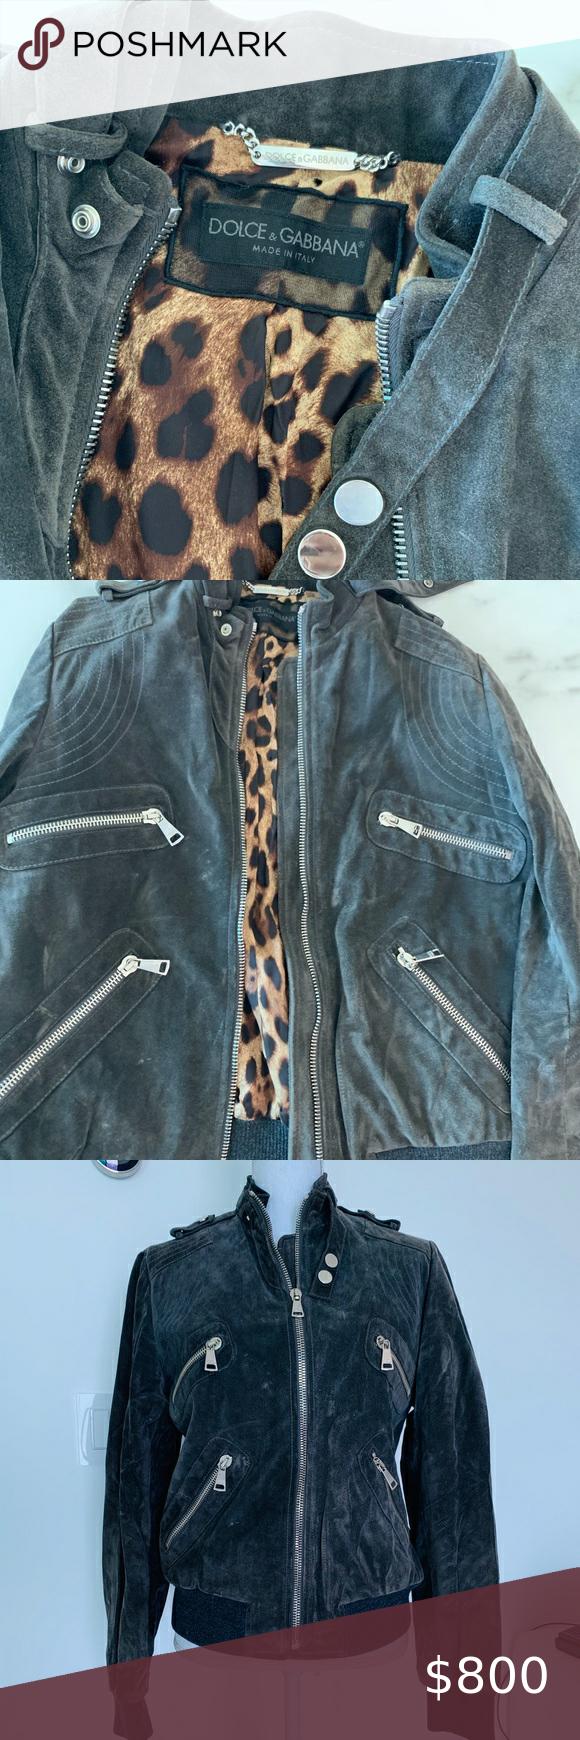 Host Pick Dolce Gabbana Motto Jacket Stunning Grey Suede D G Jacket Size 44 Italian Us 8 Used Vintage Denim Jeans Black Floral Jacket Dolce And Gabbana [ 1740 x 580 Pixel ]